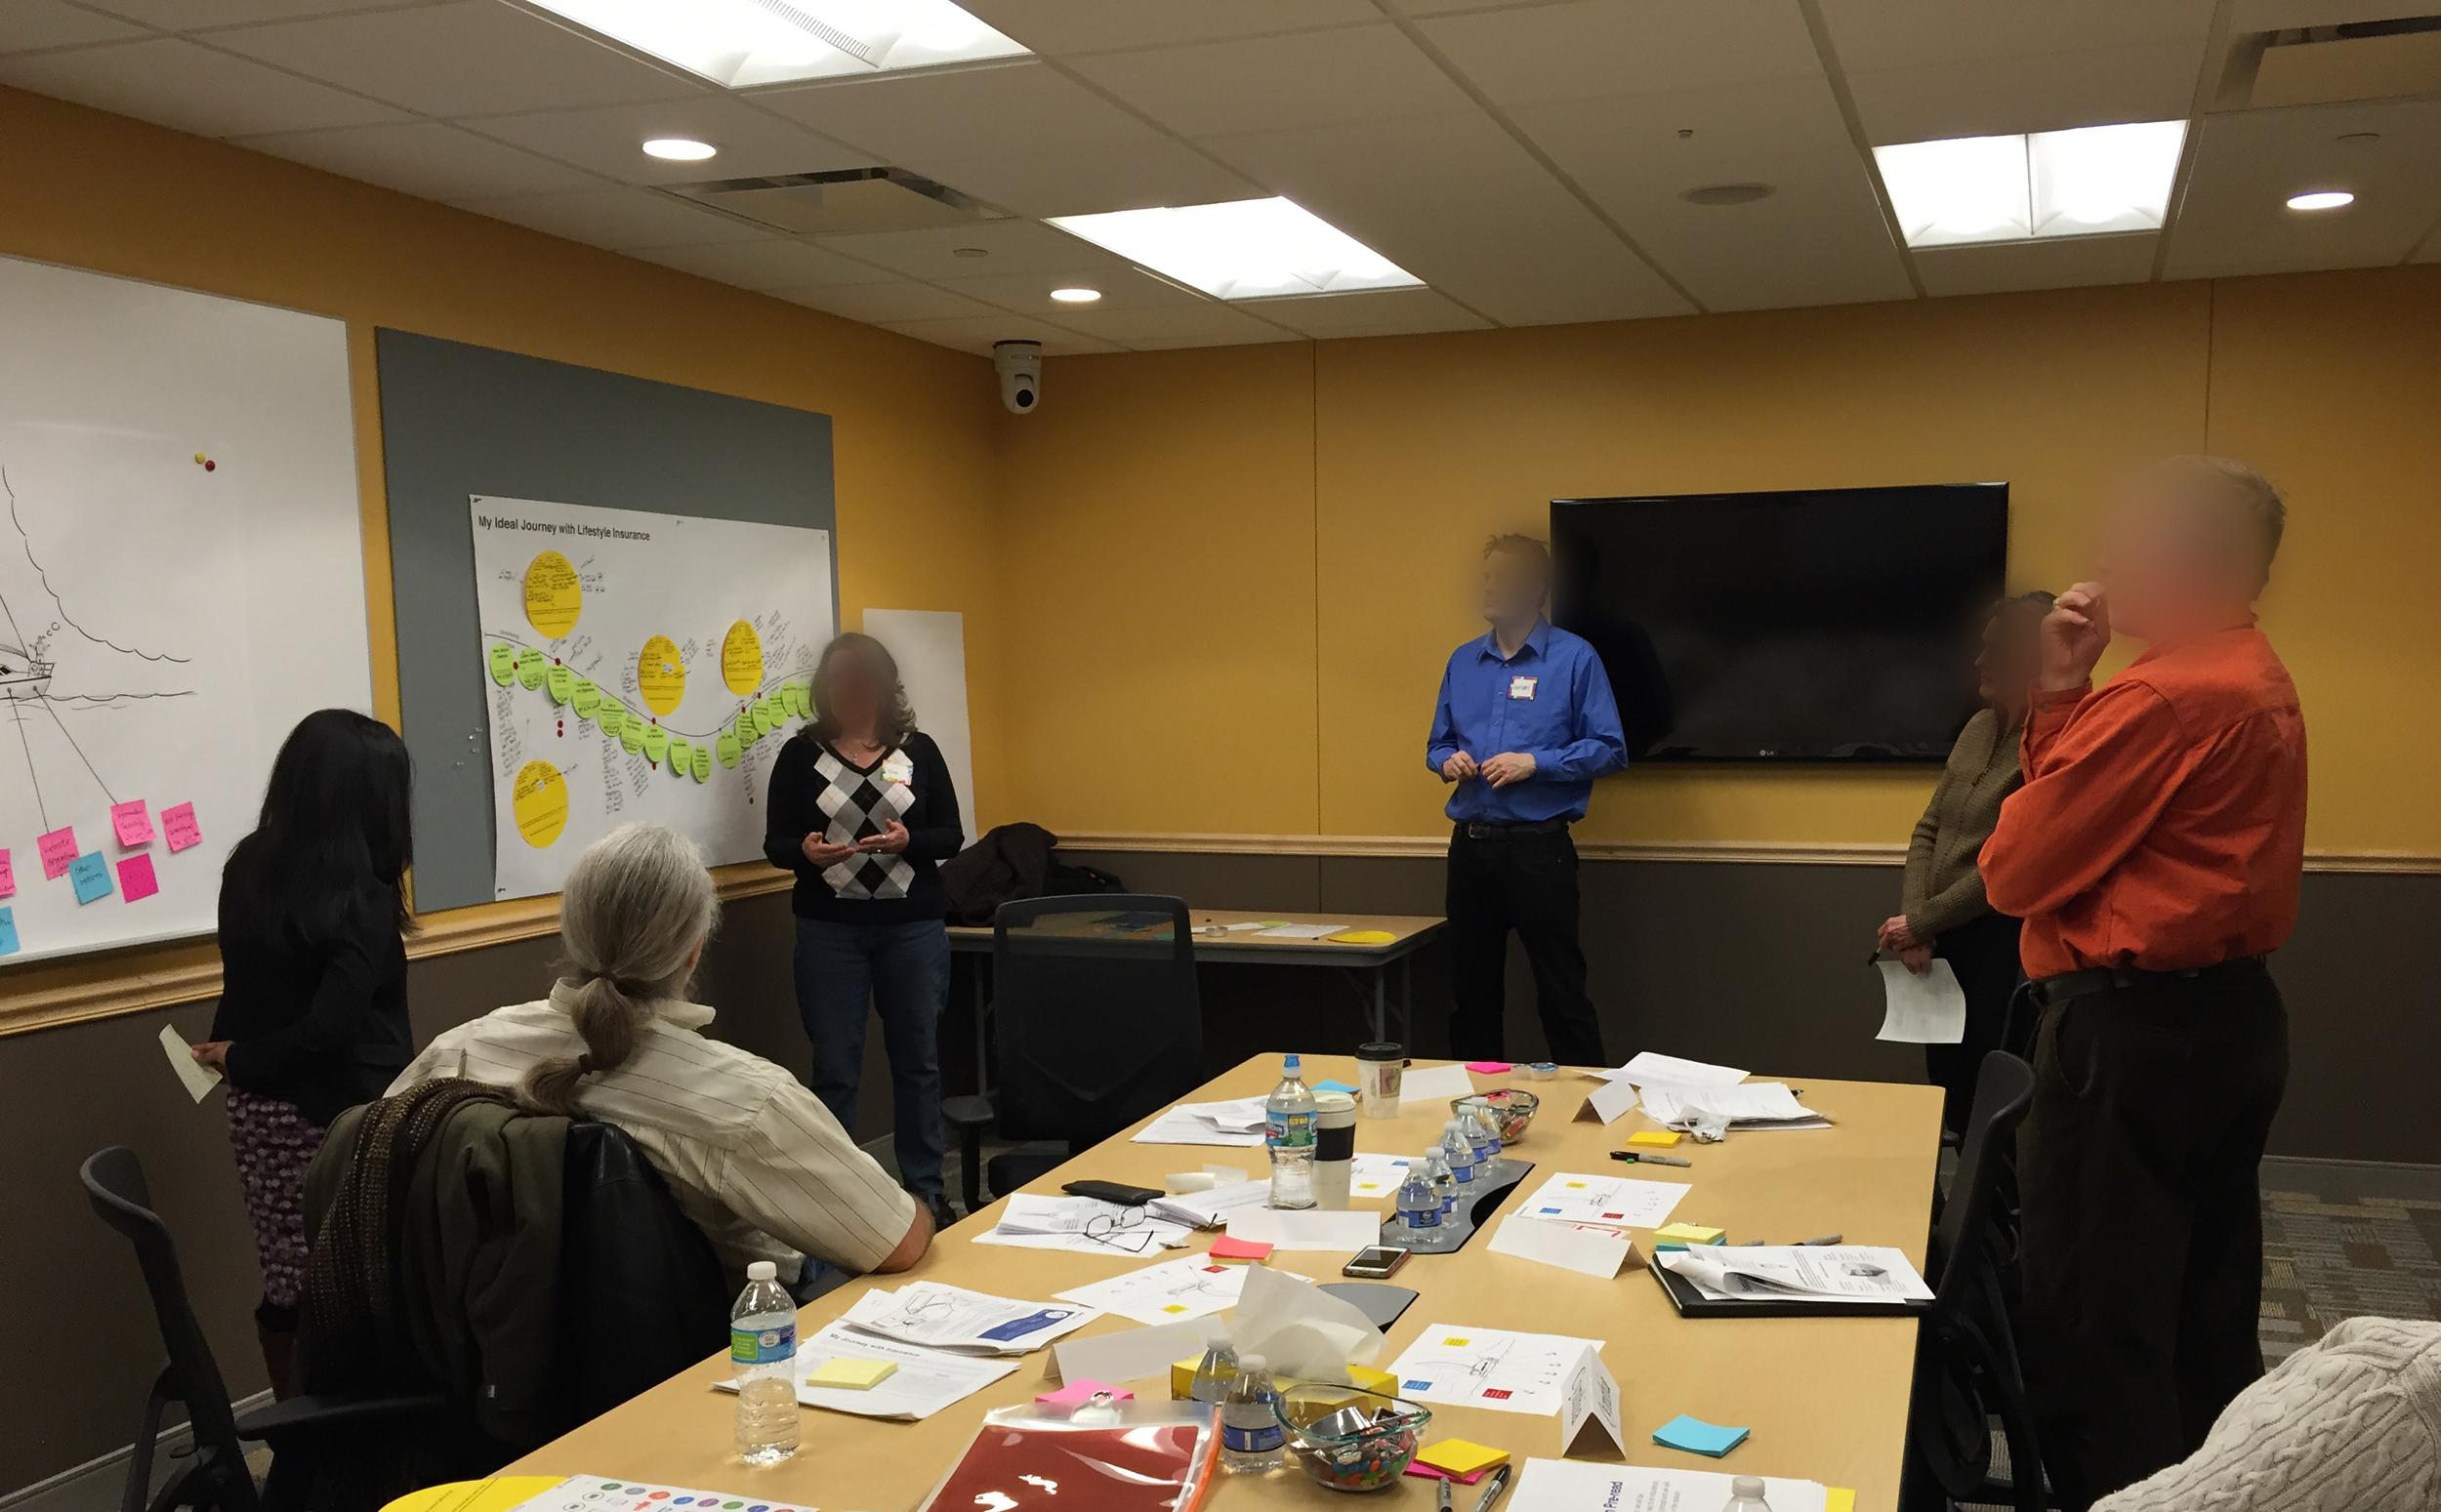 Consumer workshop in action